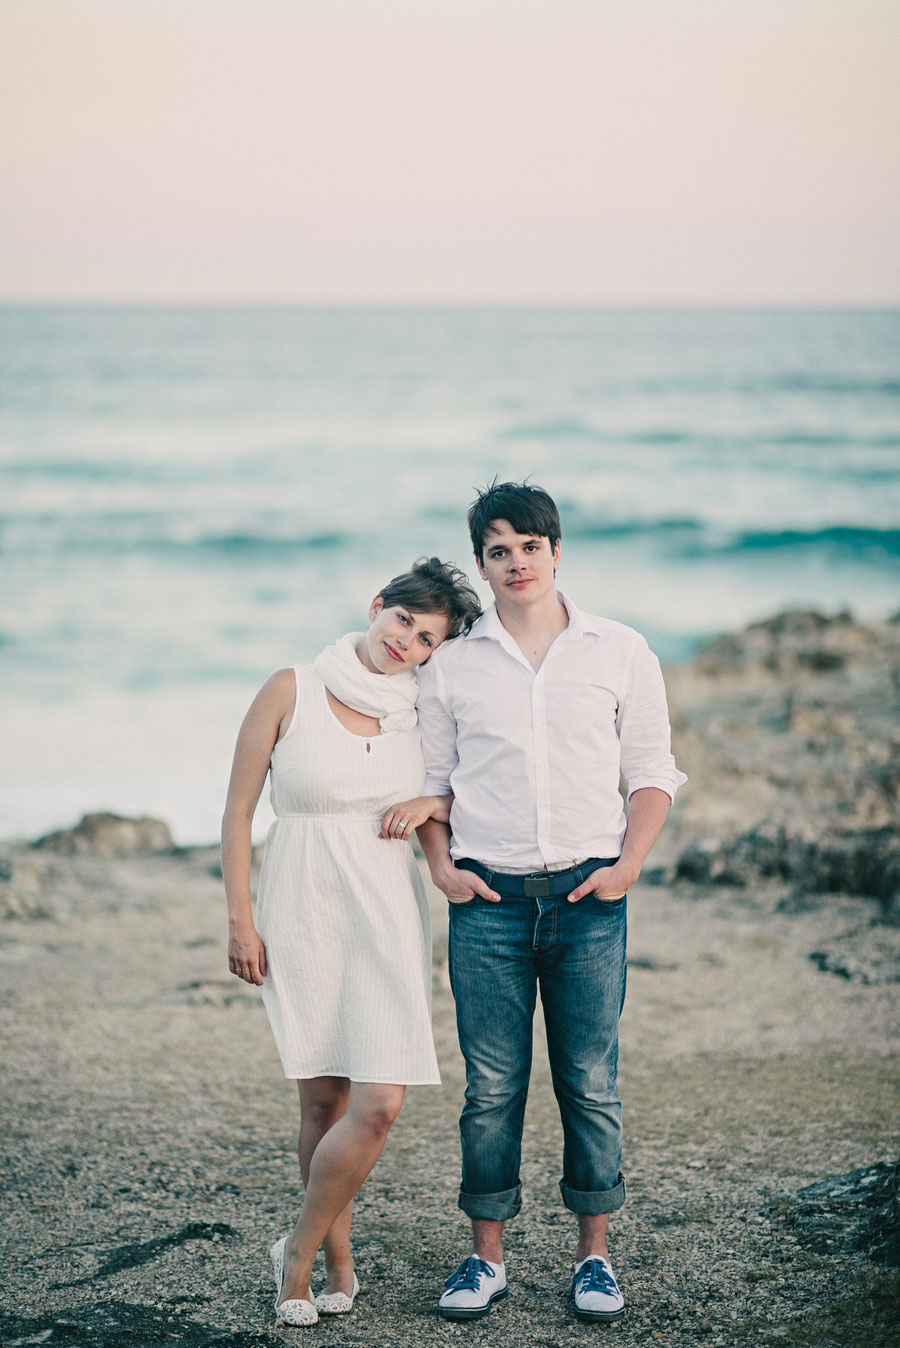 wedding-photography-stradbroke-island-049.jpg